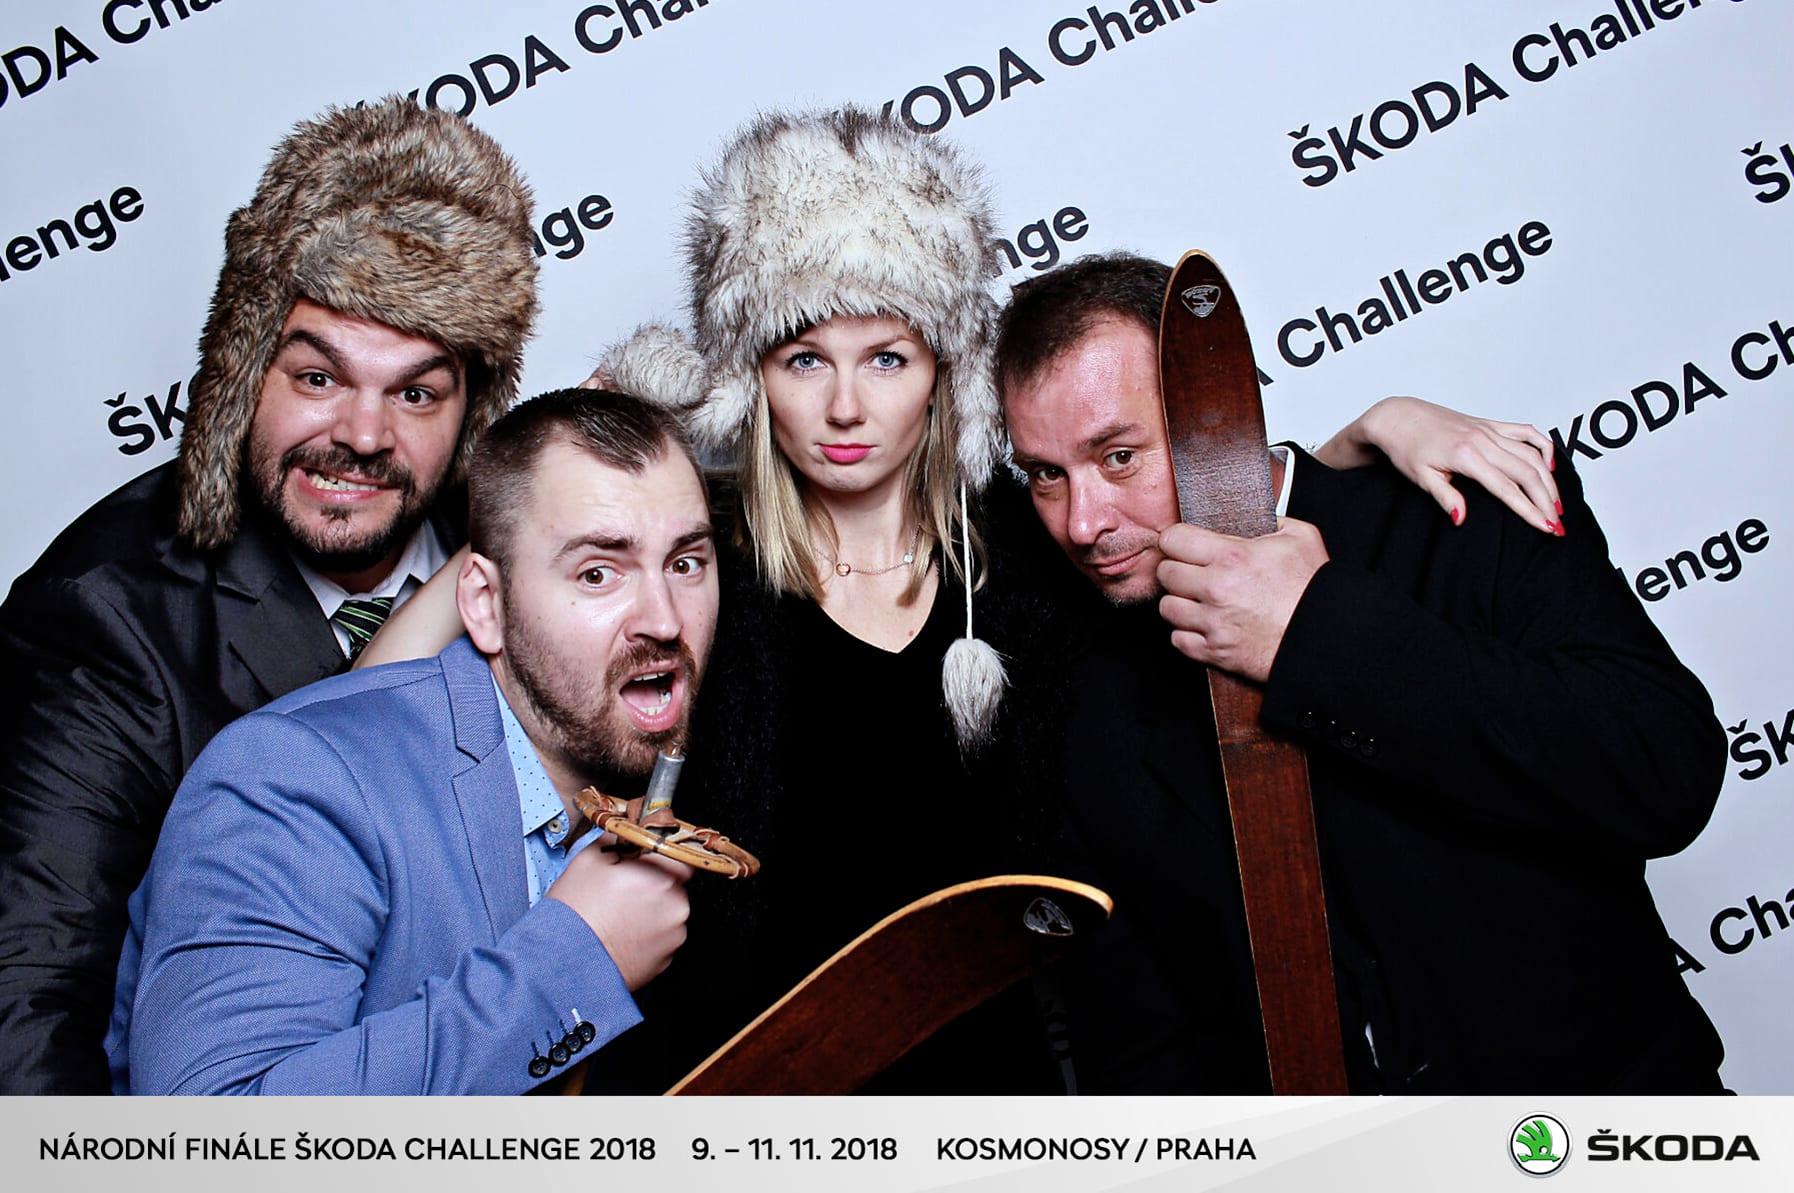 fotokoutek-skoda-10-11-2018-520524